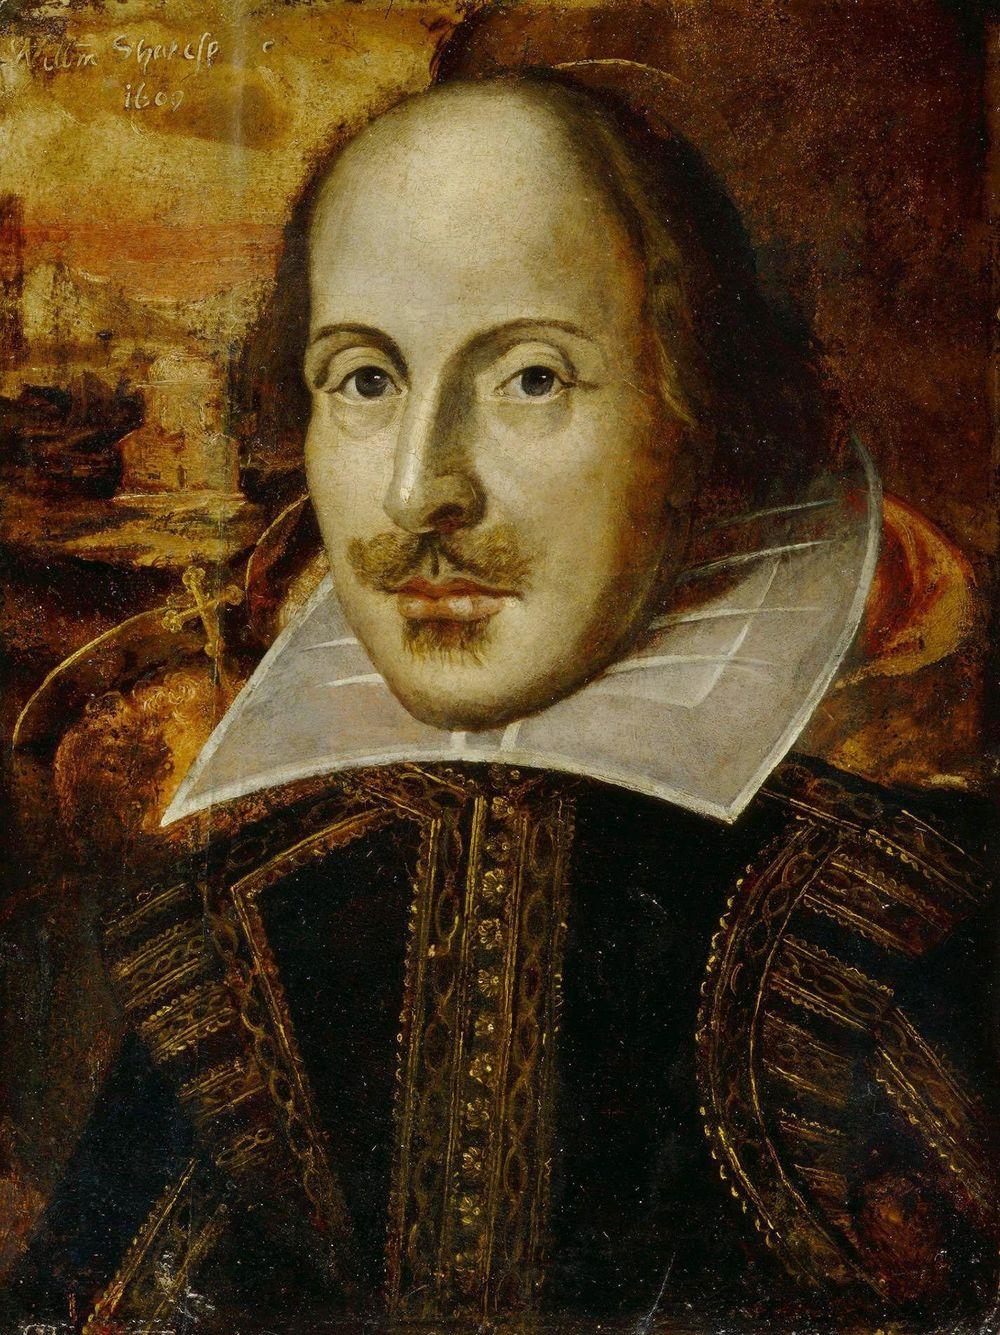 William_Shakespeare_1609.jpg